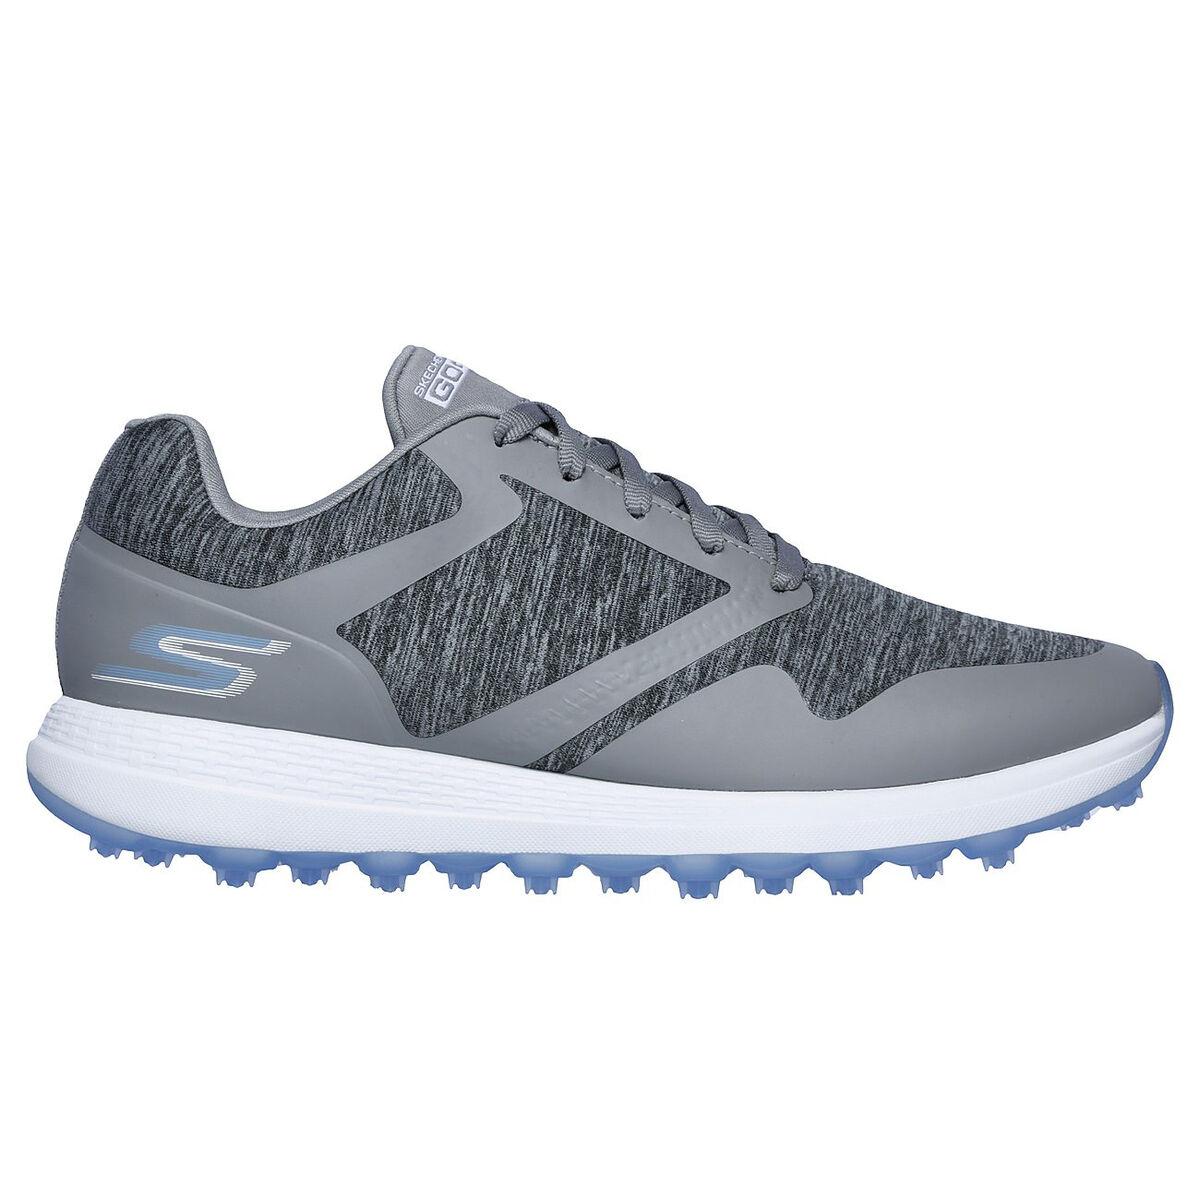 f1a57e091 Images. Skechers GO GOLF Max Cut Women  39 s Golf Shoe - Grey Blue